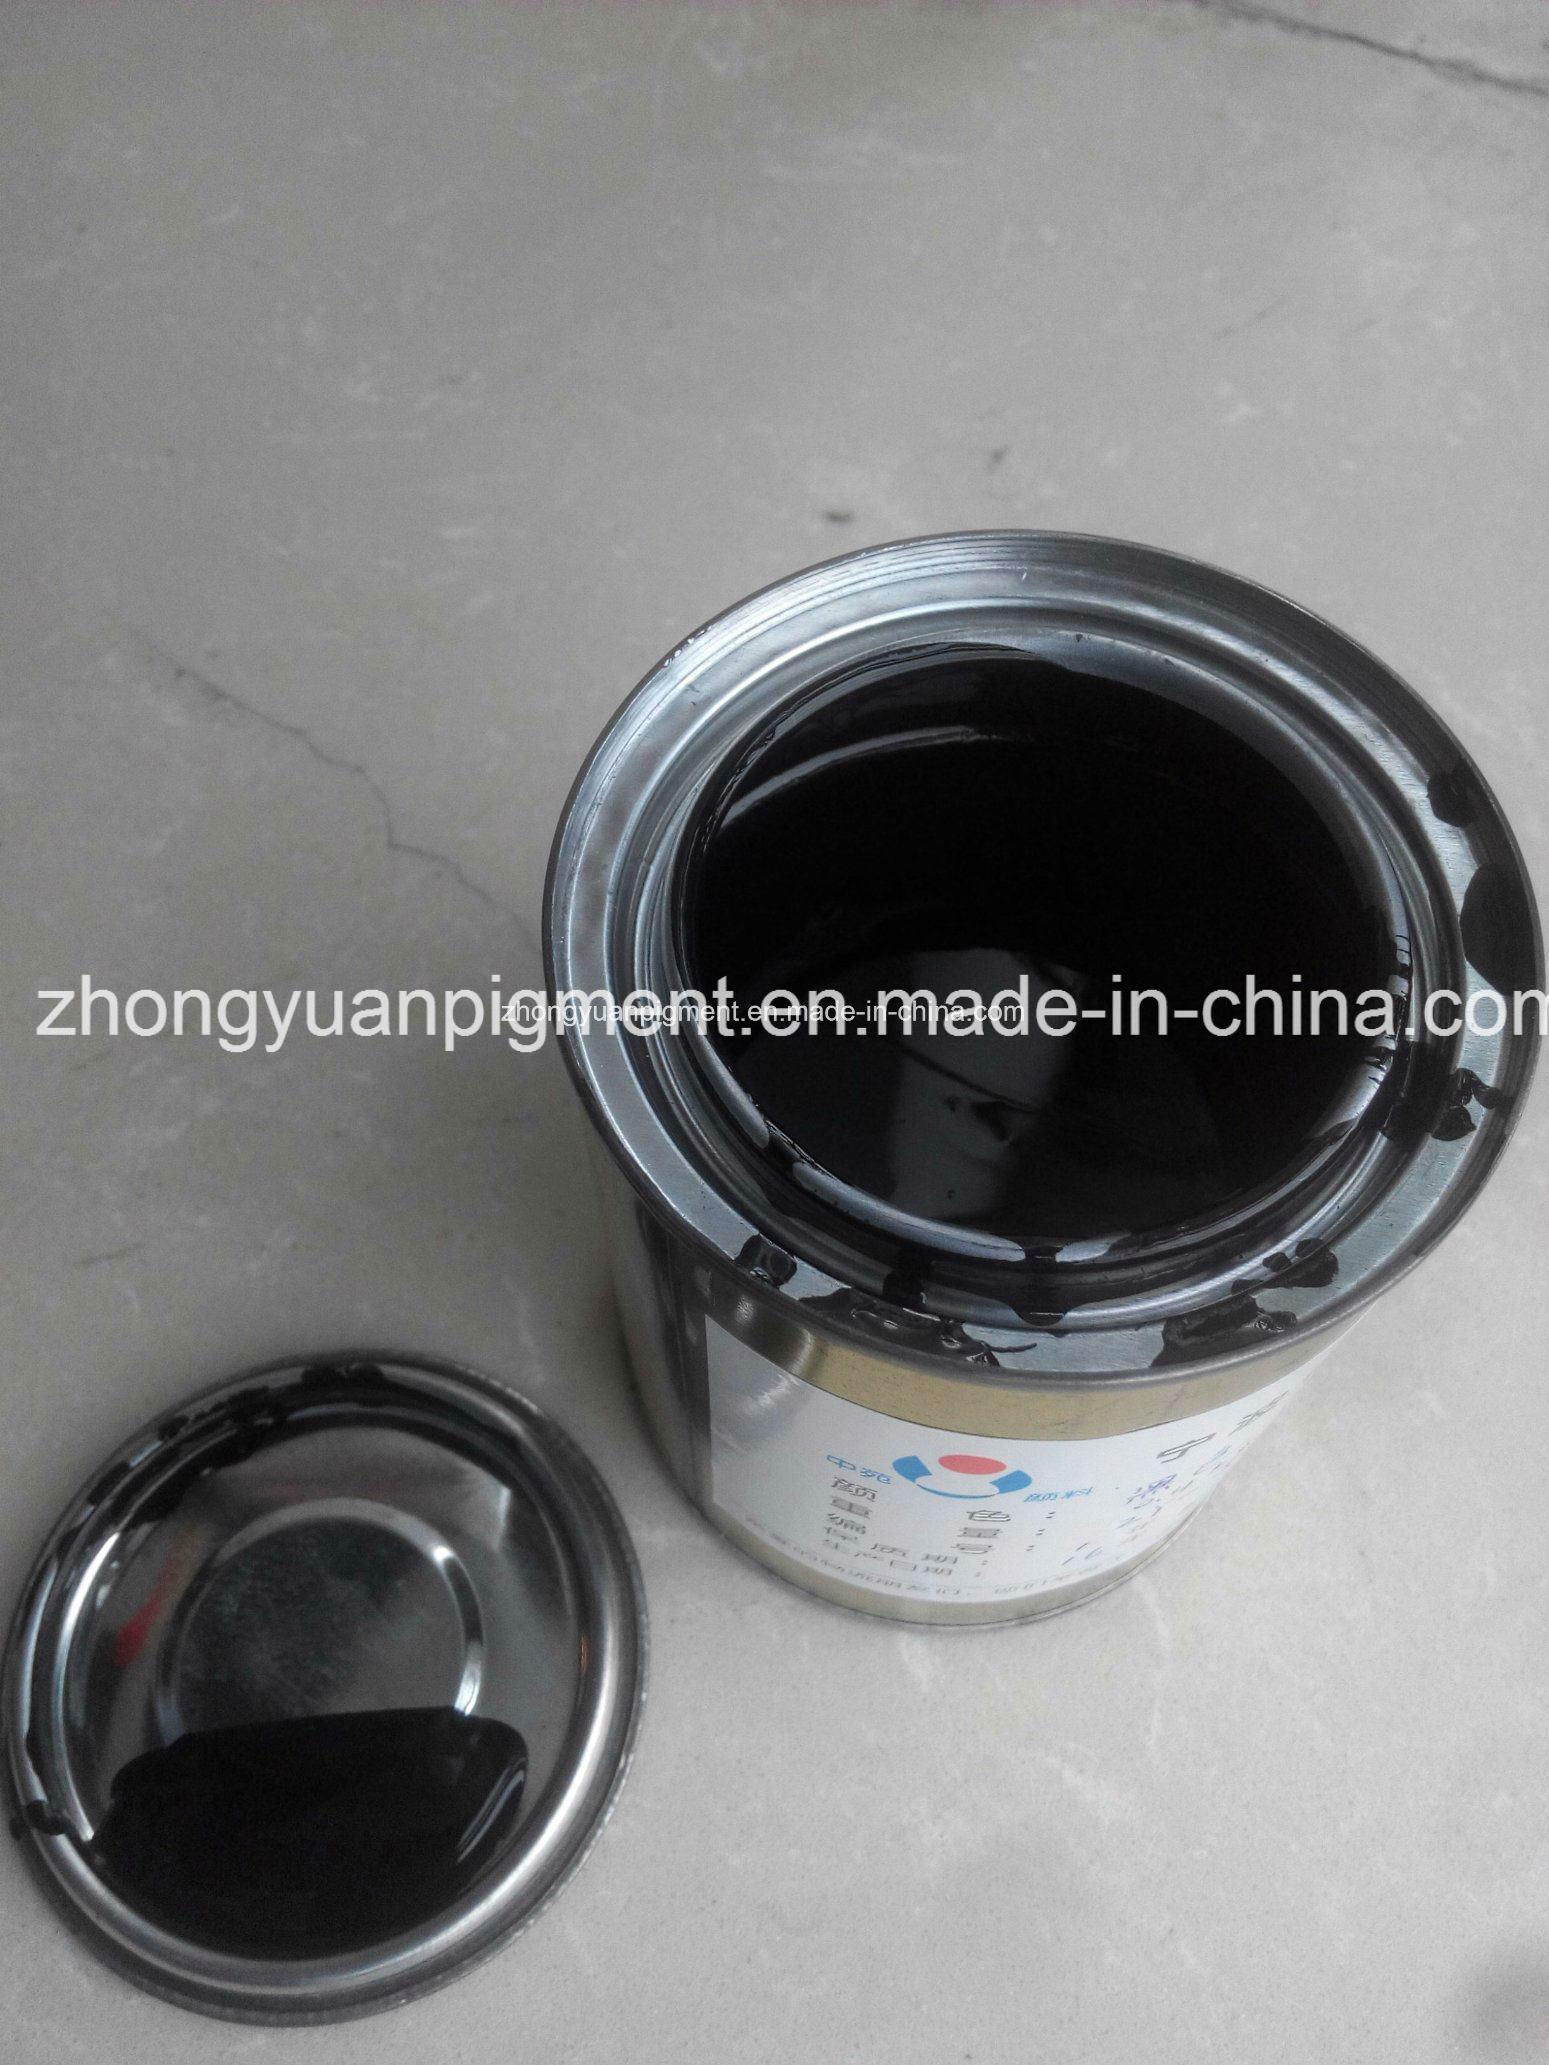 Colorant for Flexible PU Foam Sponge Tdi Polyether Color Paste